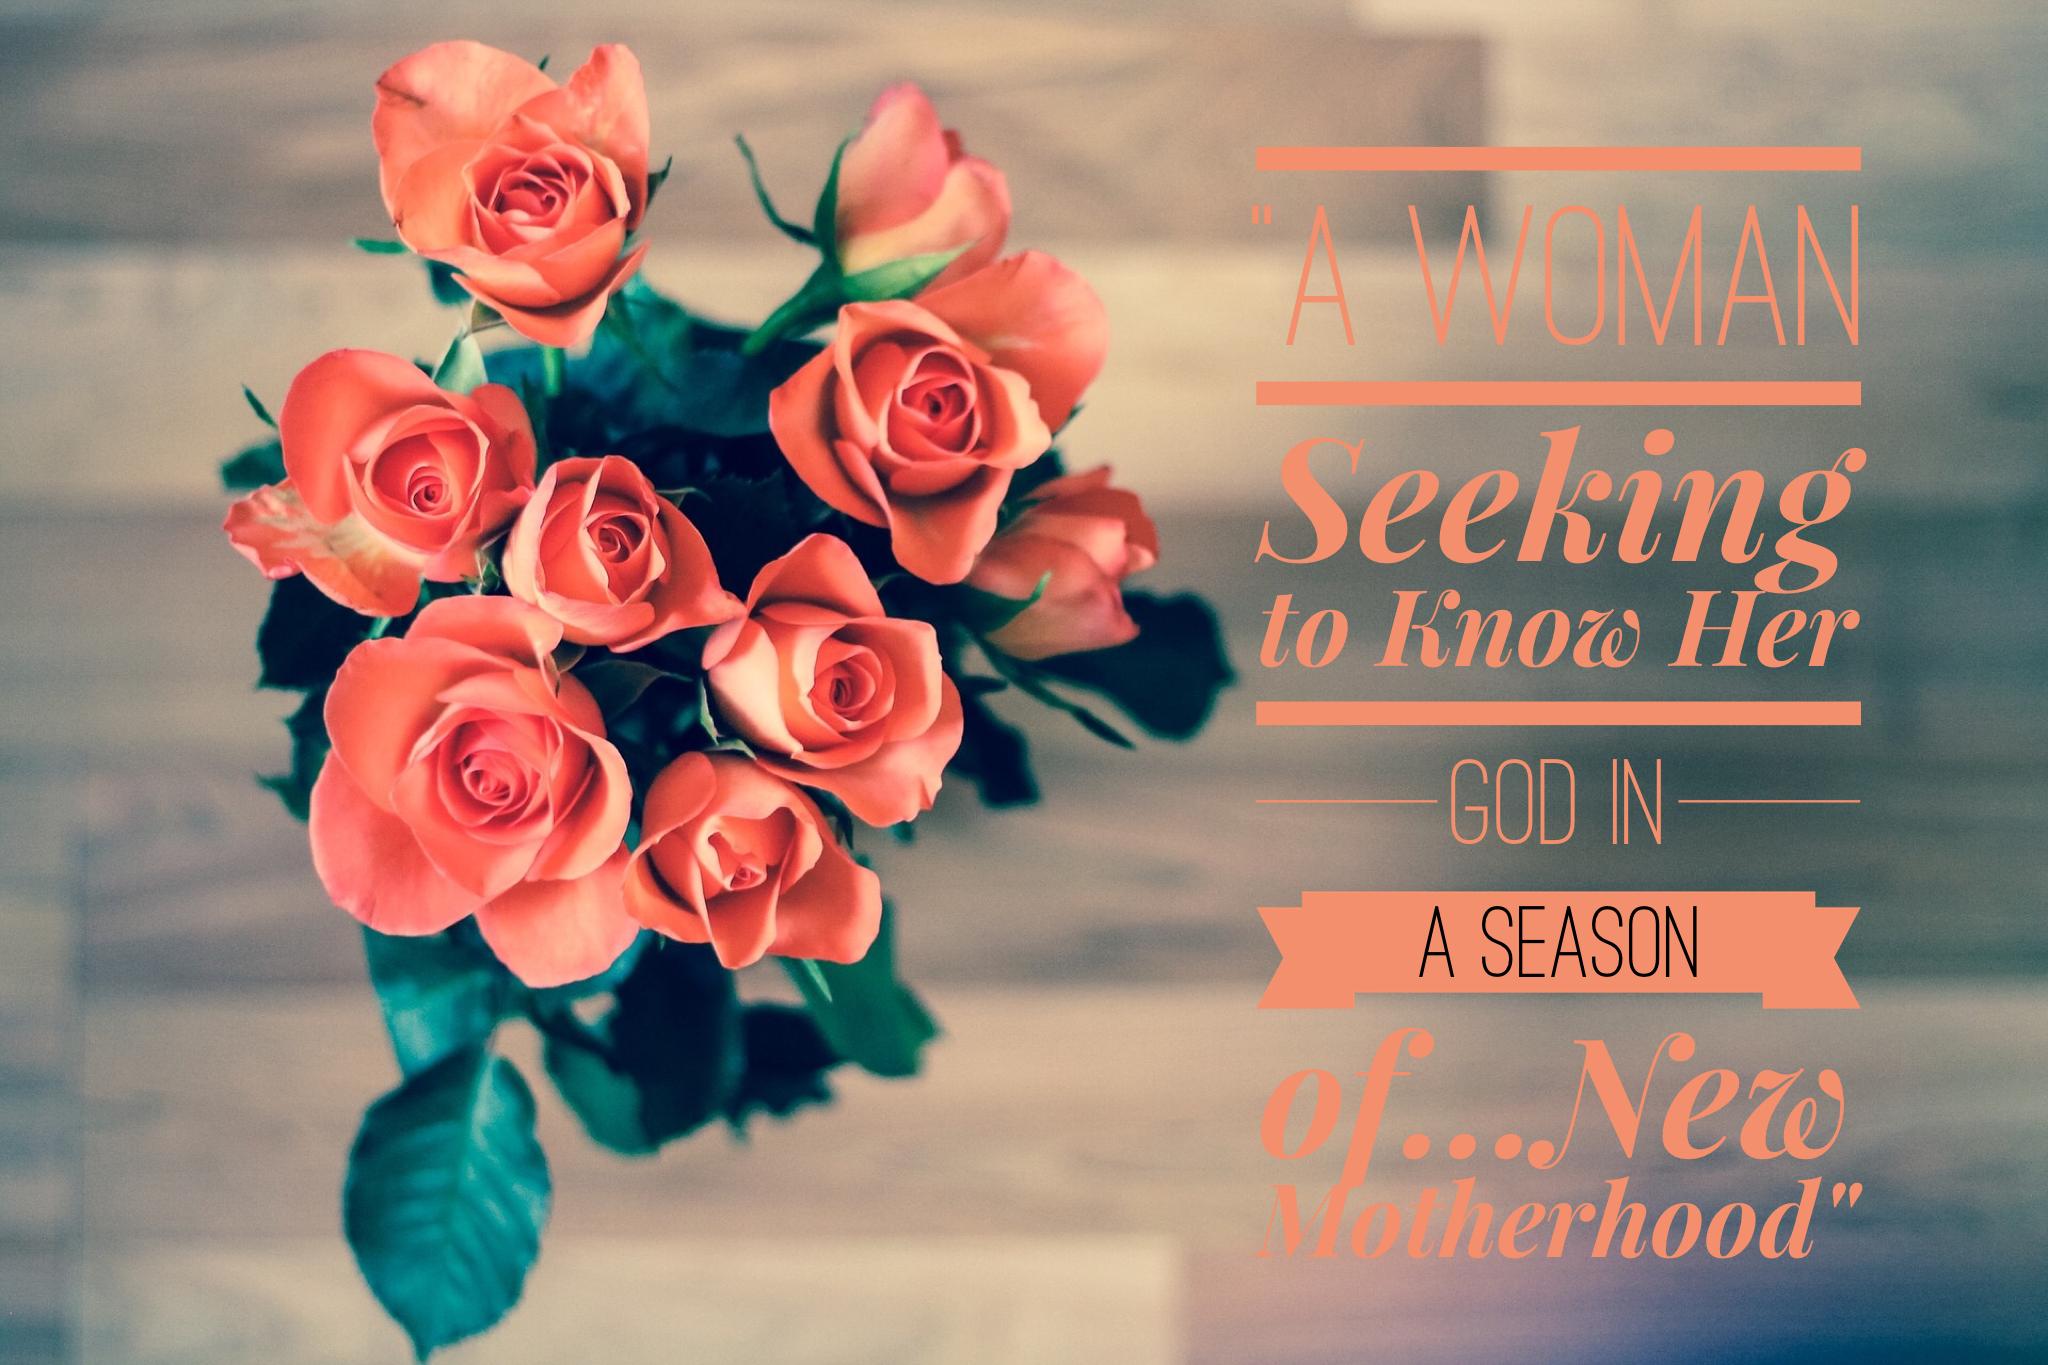 A Woman Seeking to Know Her God in a Season of New Motherhood | www.codyandras.com/blog/2017/8/24/a-woman-seeking-to-know-her-god-in-a-season-of-new-motherhood